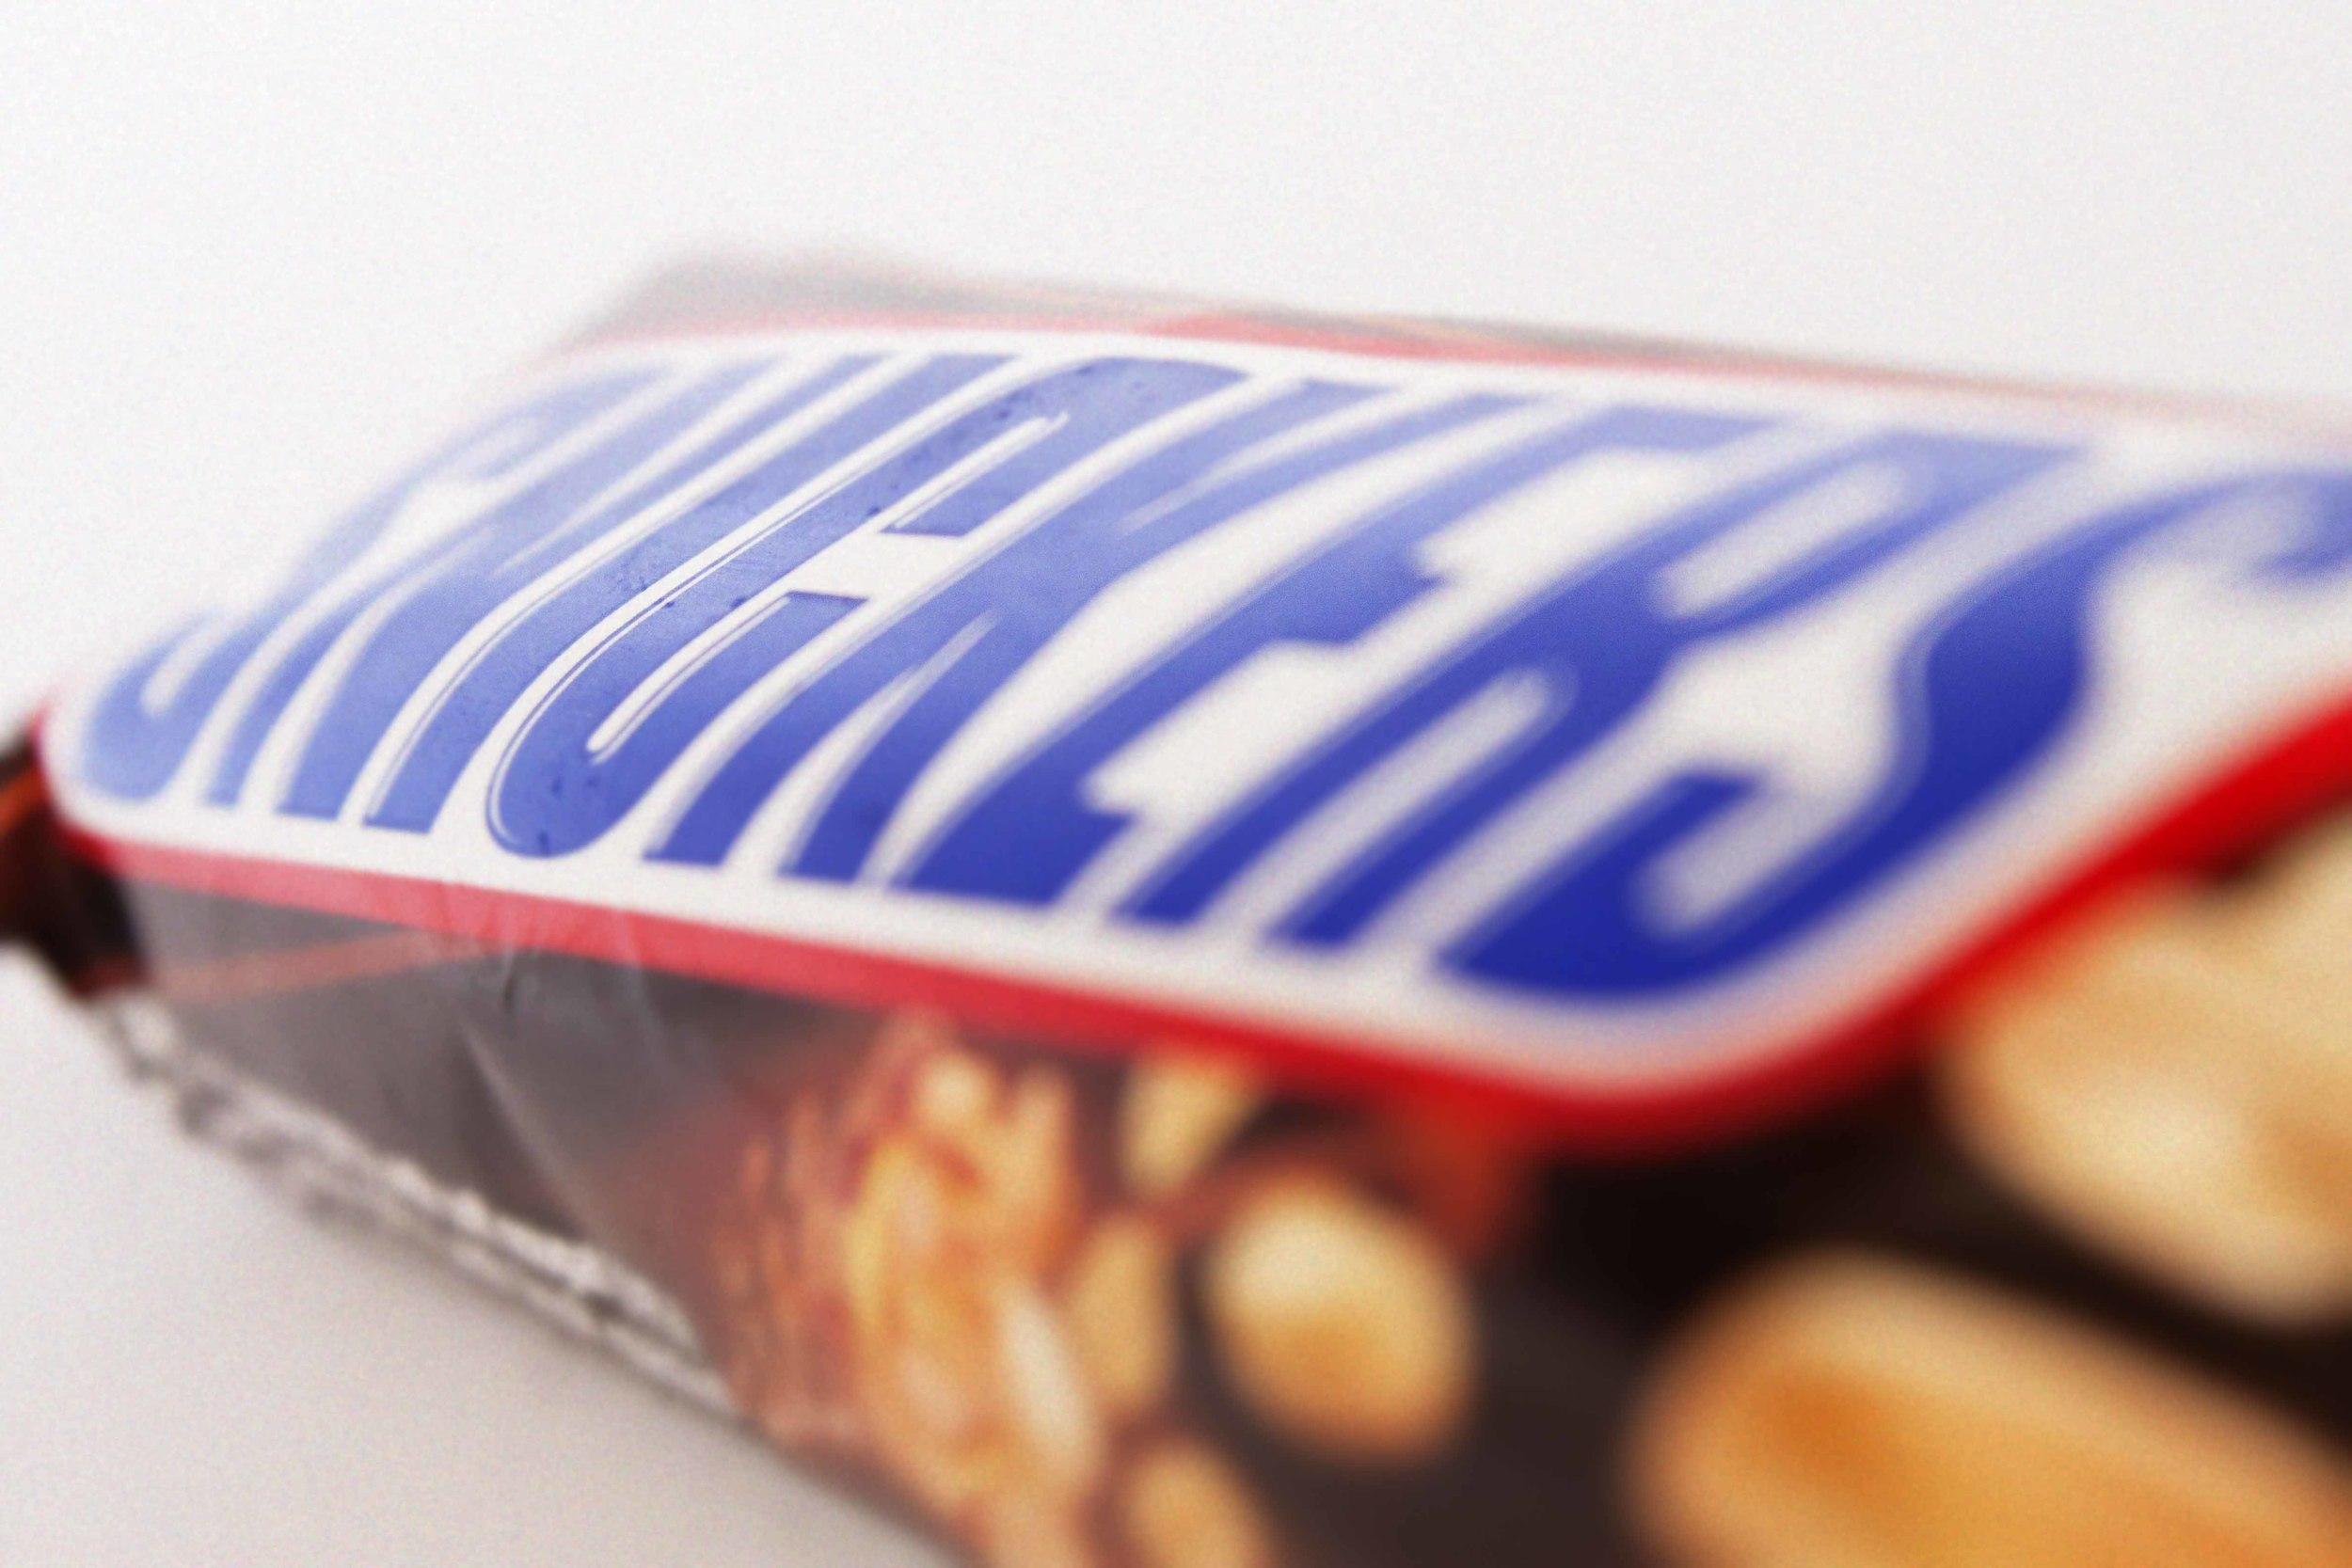 Snickers CU 3.jpg